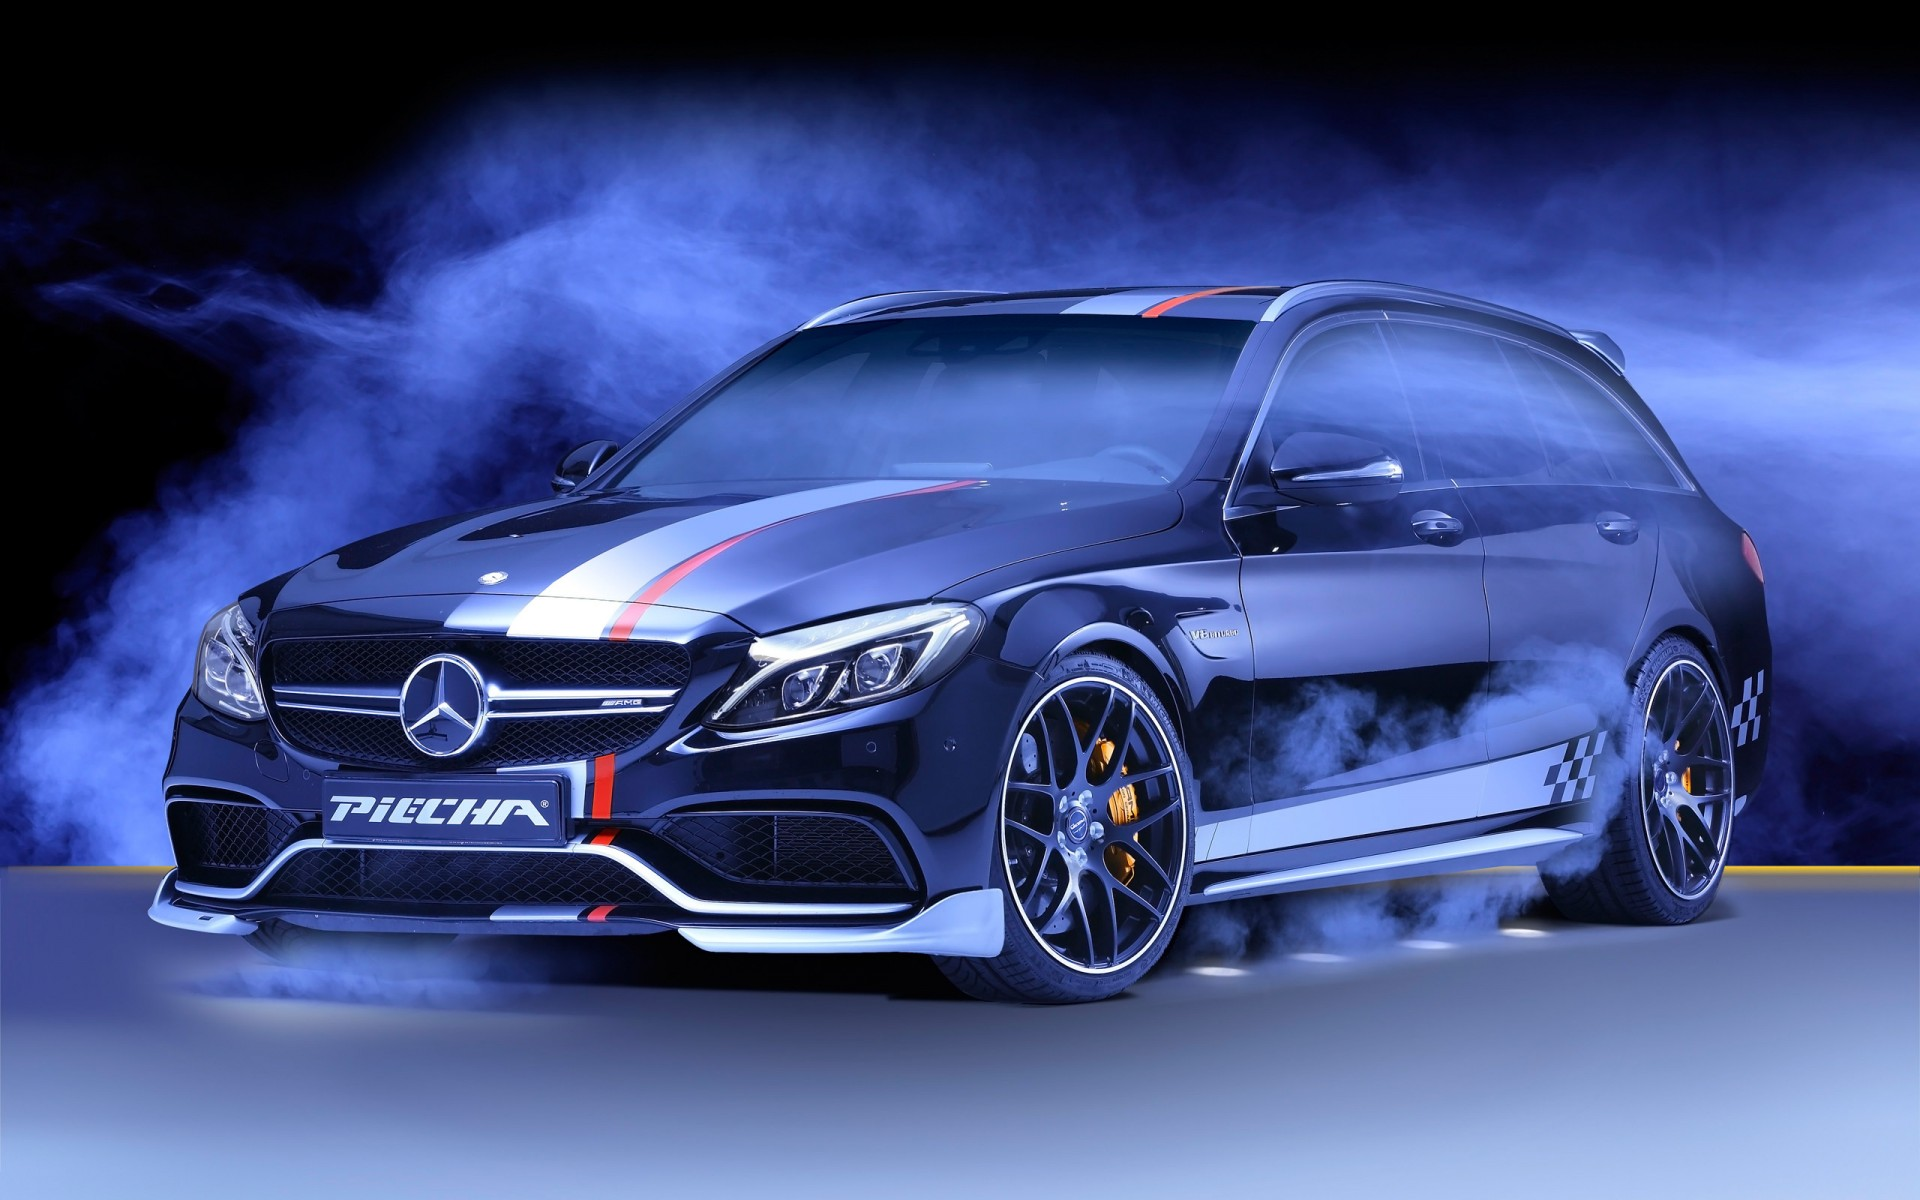 Mercedes Benz Amg >> 2016 Piecha Design Mercedes AMG C63 Estate Black Wallpaper ...